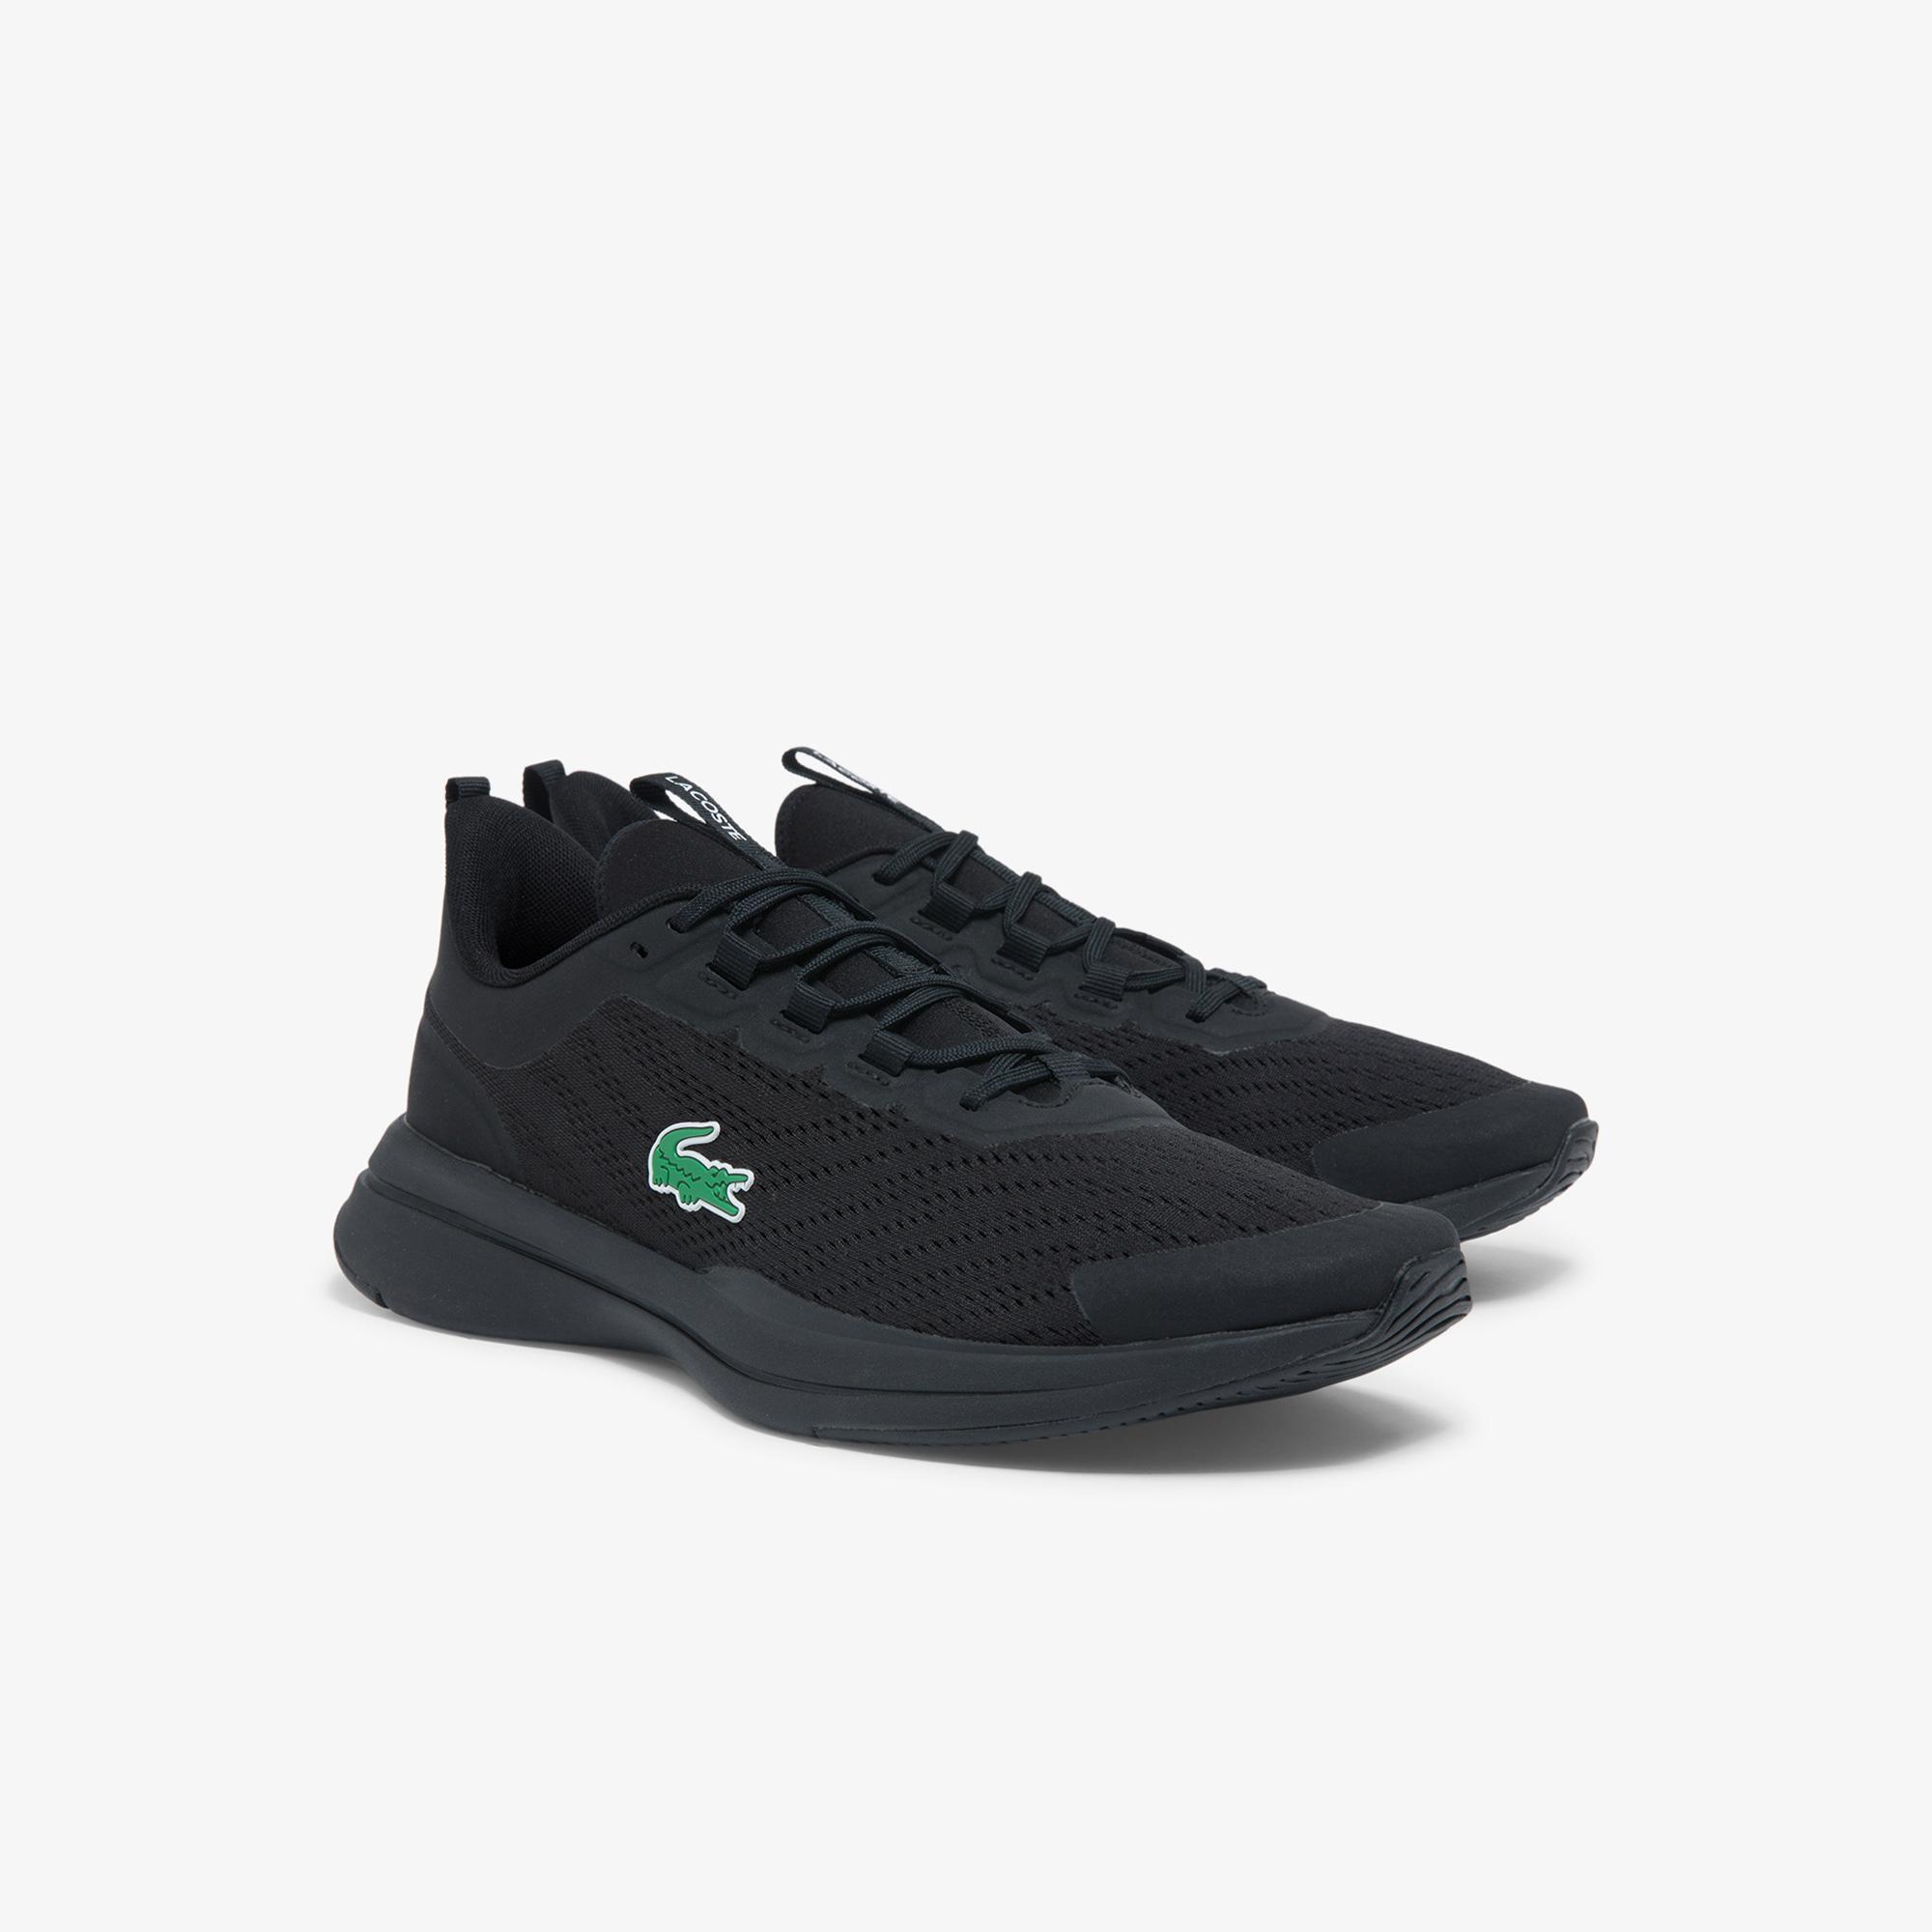 Lacoste Men's Run Spin Textile Sneakers